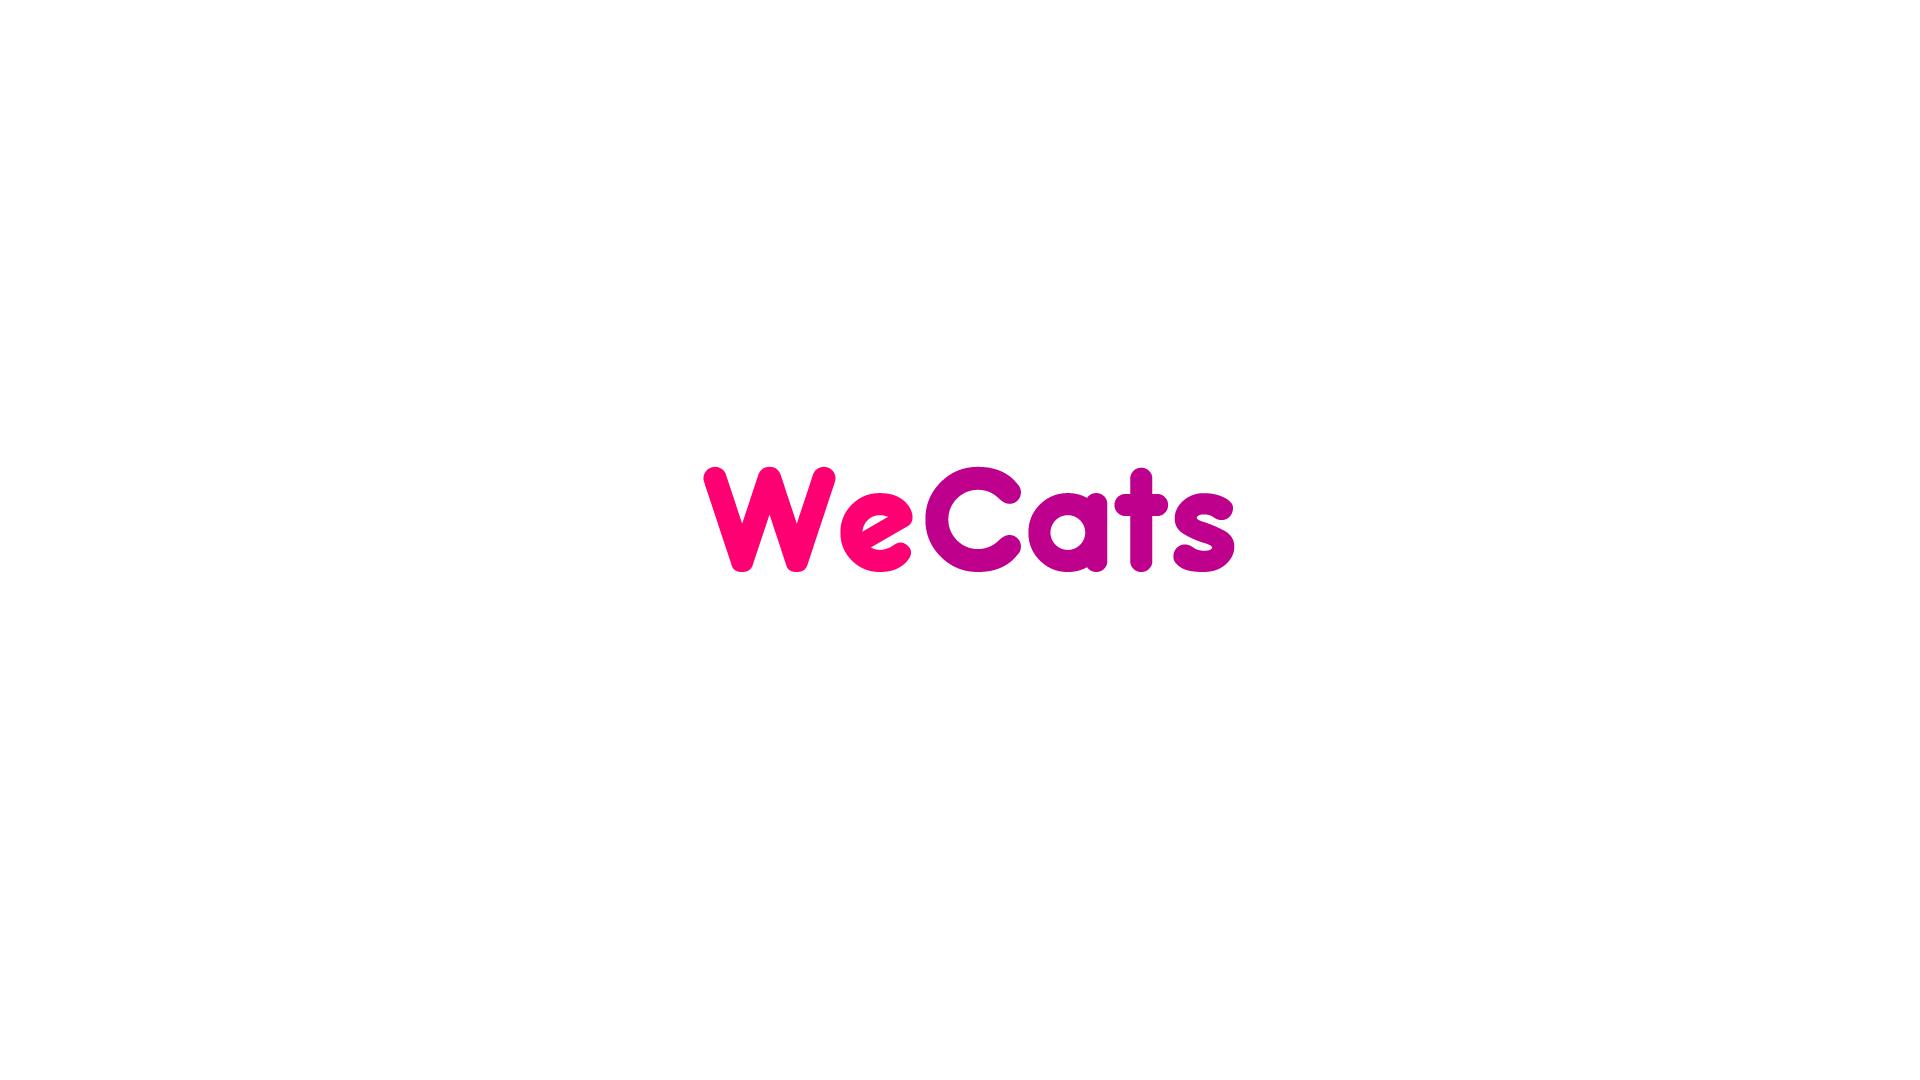 Создание логотипа WeCats фото f_1835f1dc558c94e4.jpg